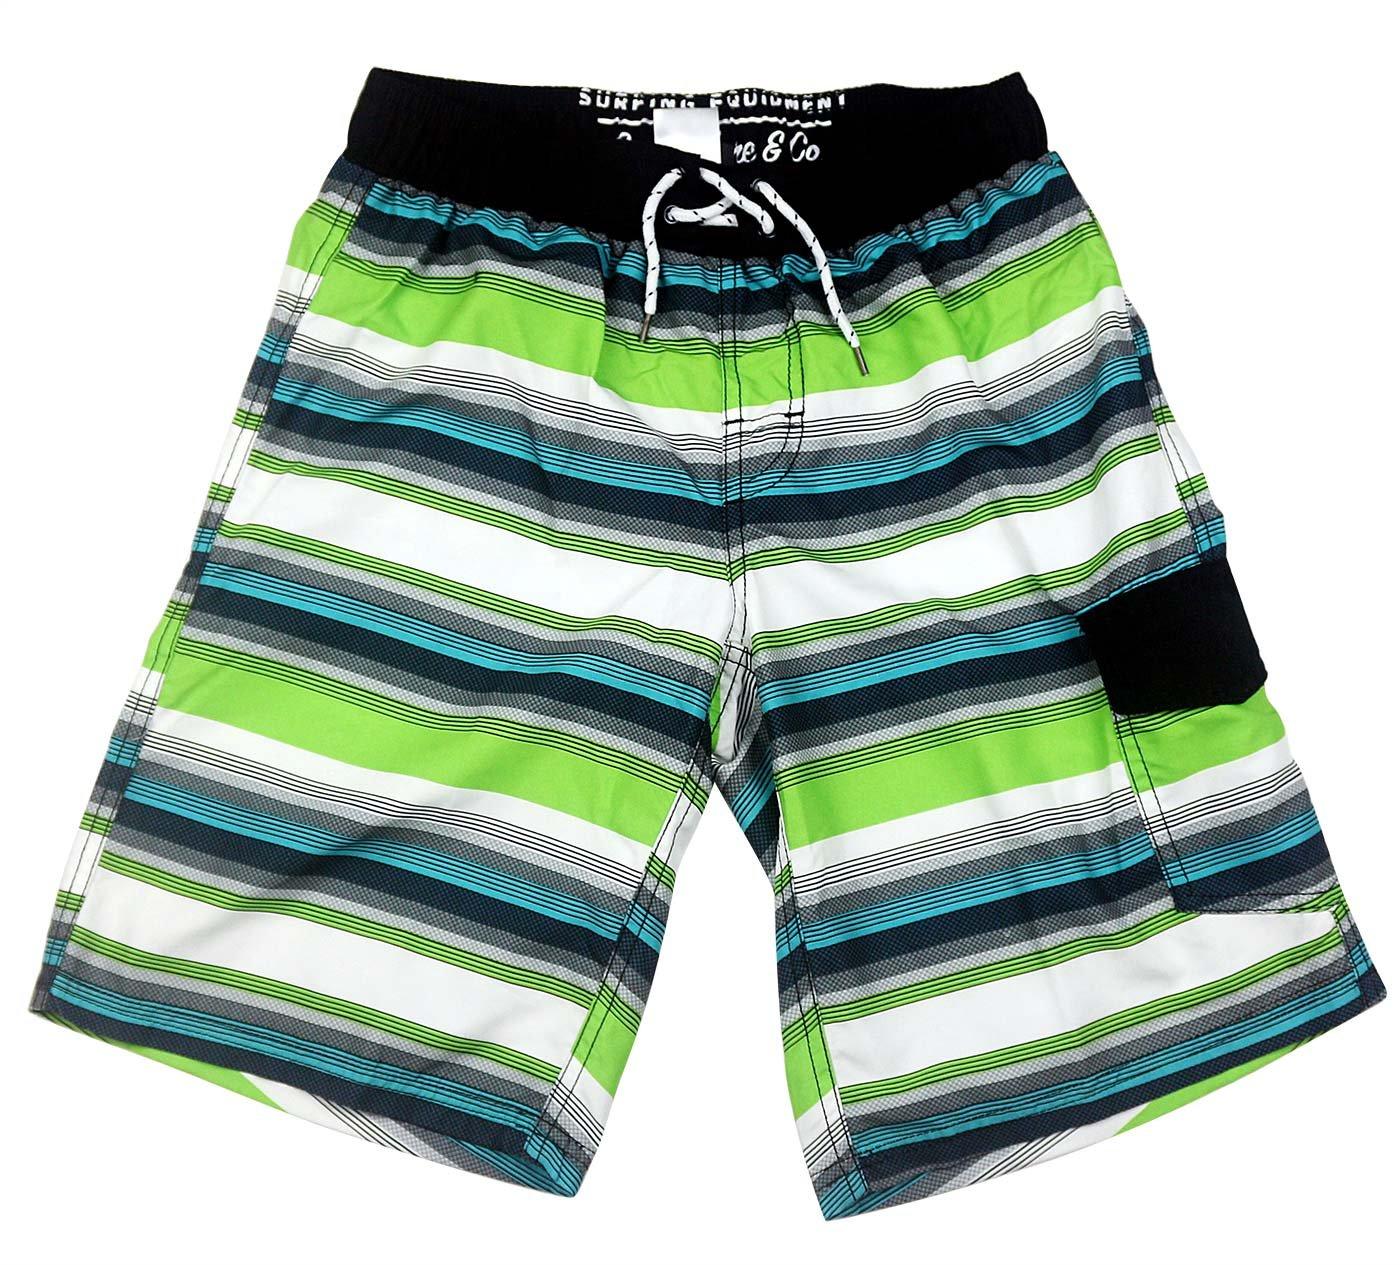 SLGADEN Boys Swim Trunks Elastic Waistband Comfortable Mesh Lined Sun Protection Summer Teens Boxer Trunks 7-8T